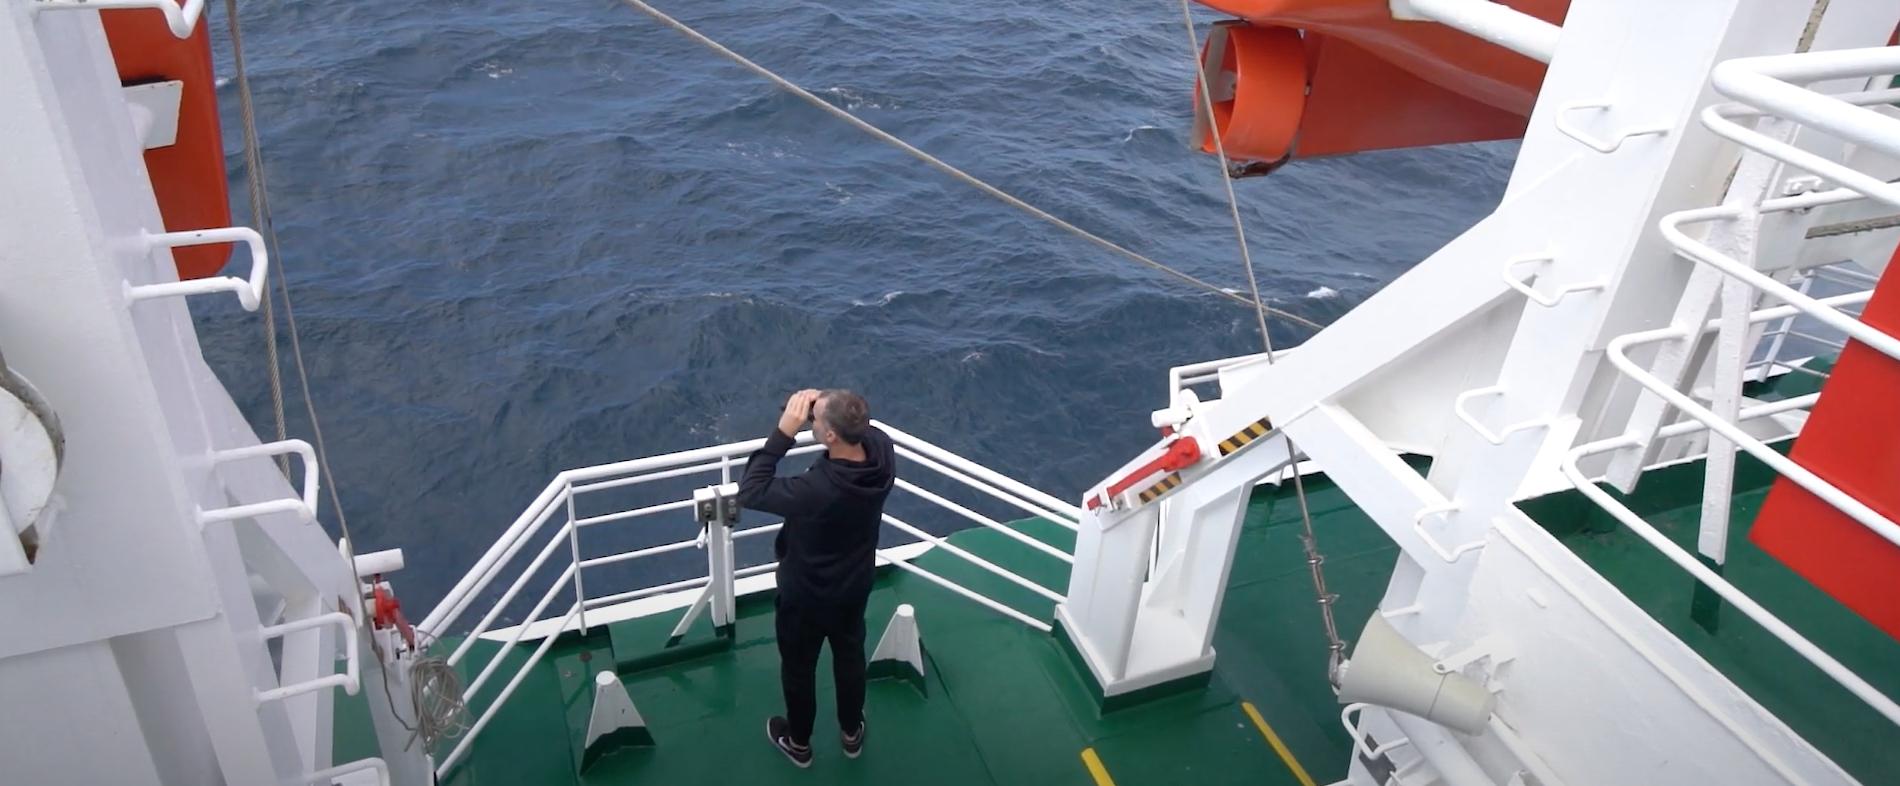 A man using binoculars to spot wildlife from an Antarctic ship